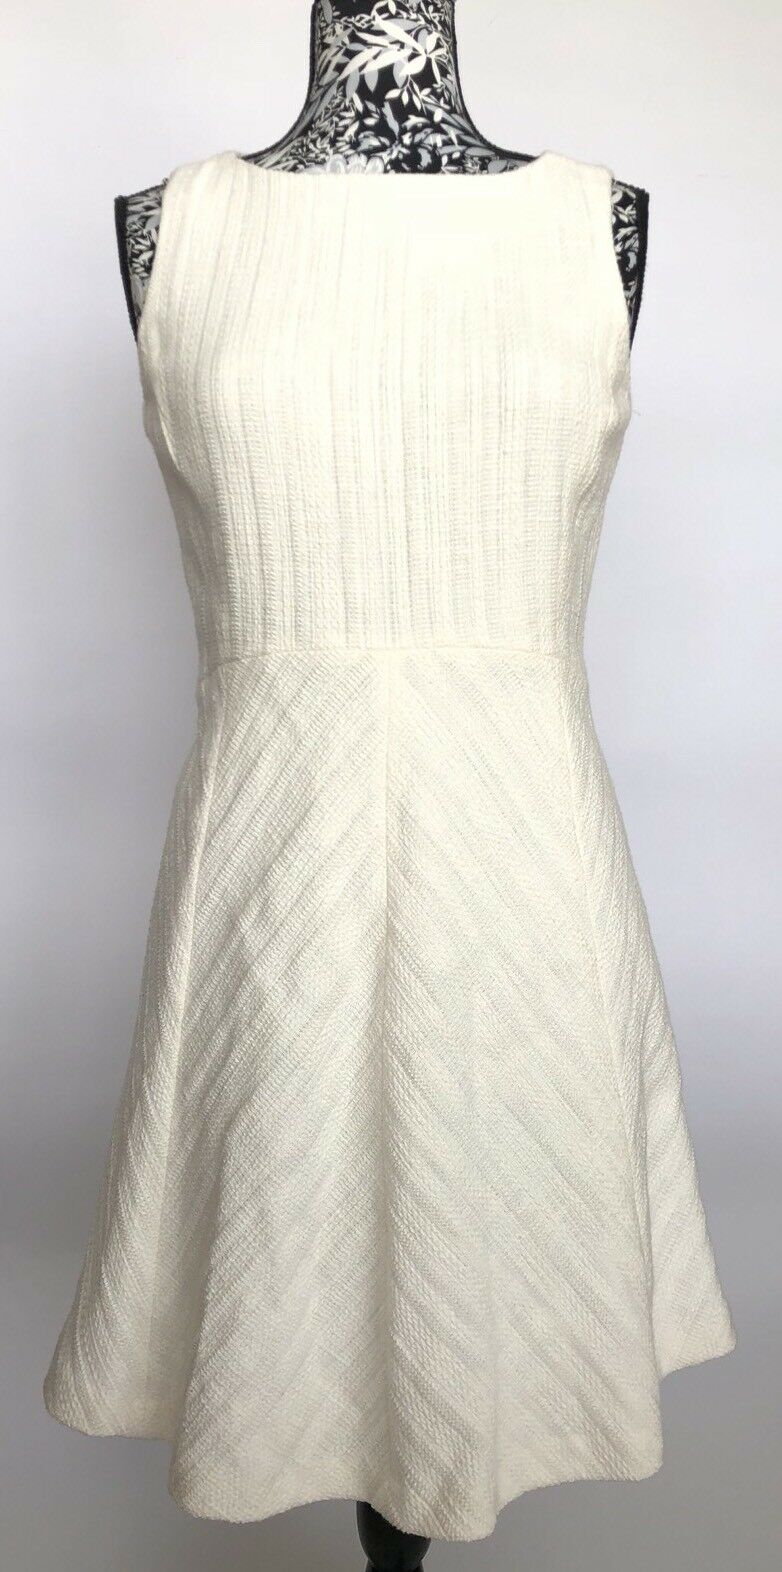 Theory Dress Größe 8 NWT off-Weiß cailen tweed classic PL flare swing dress